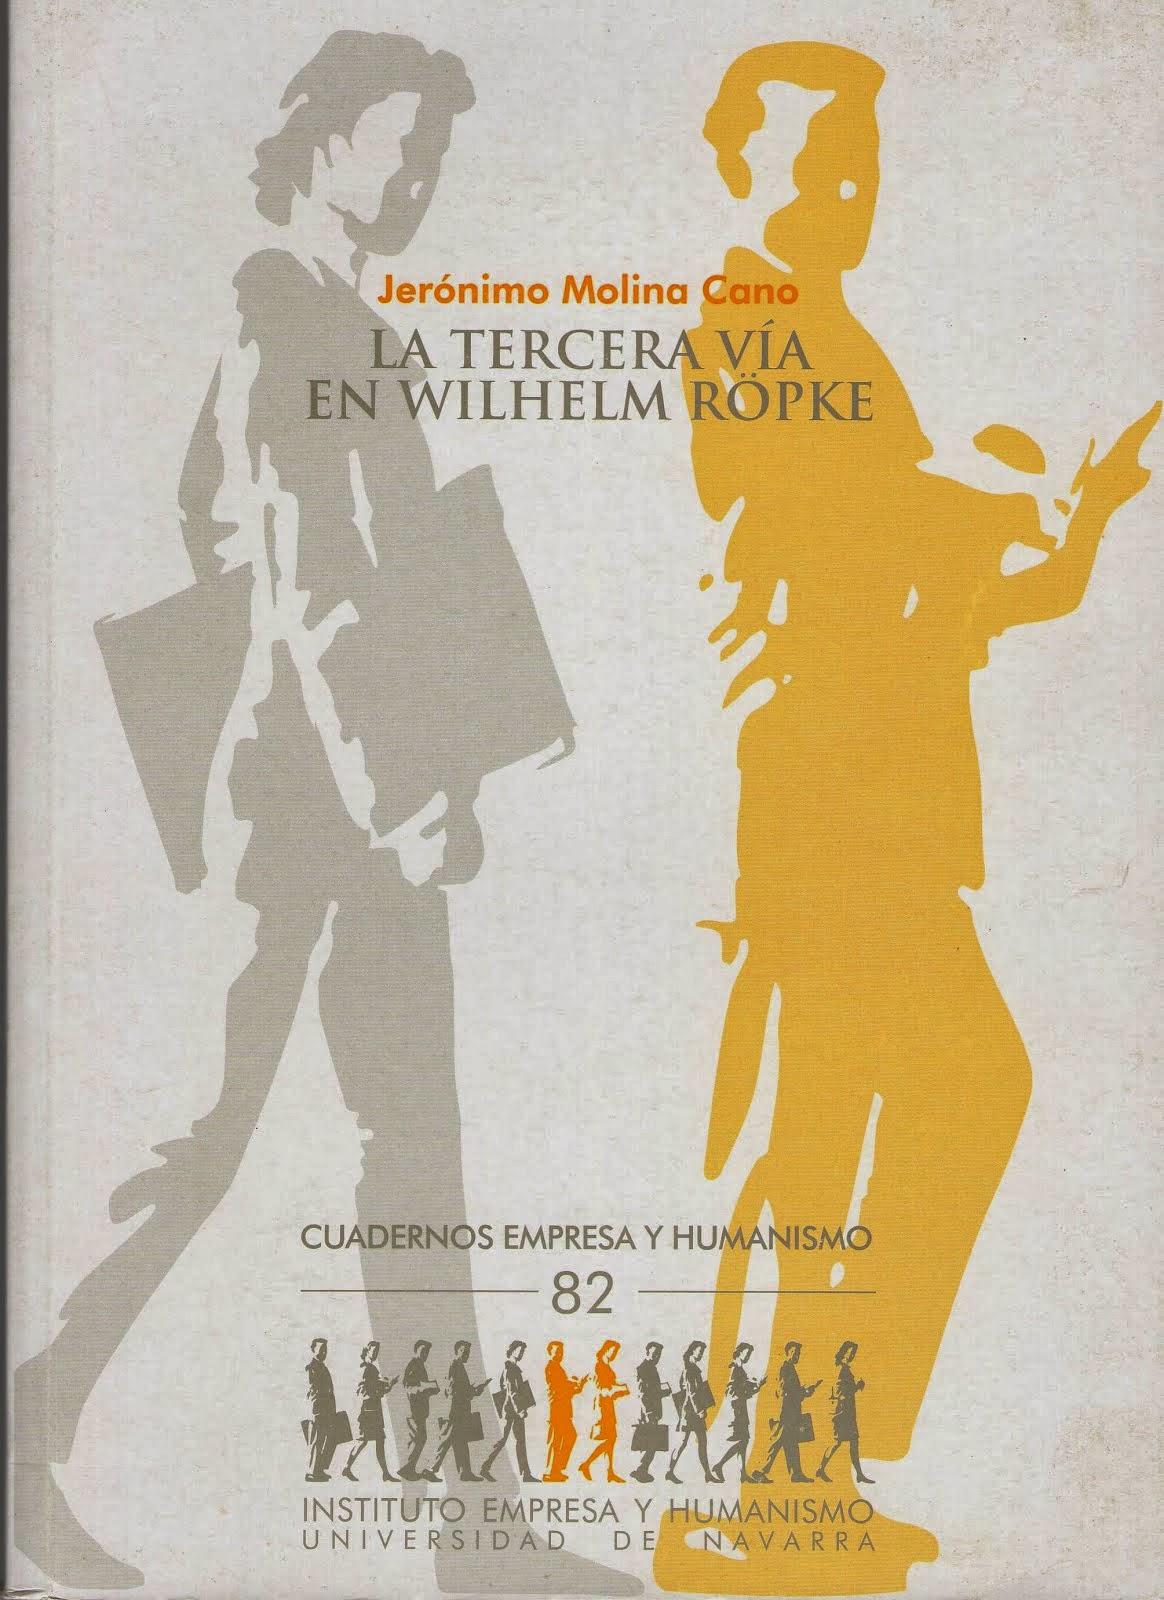 La tercera vía en Wilhelm Röpke